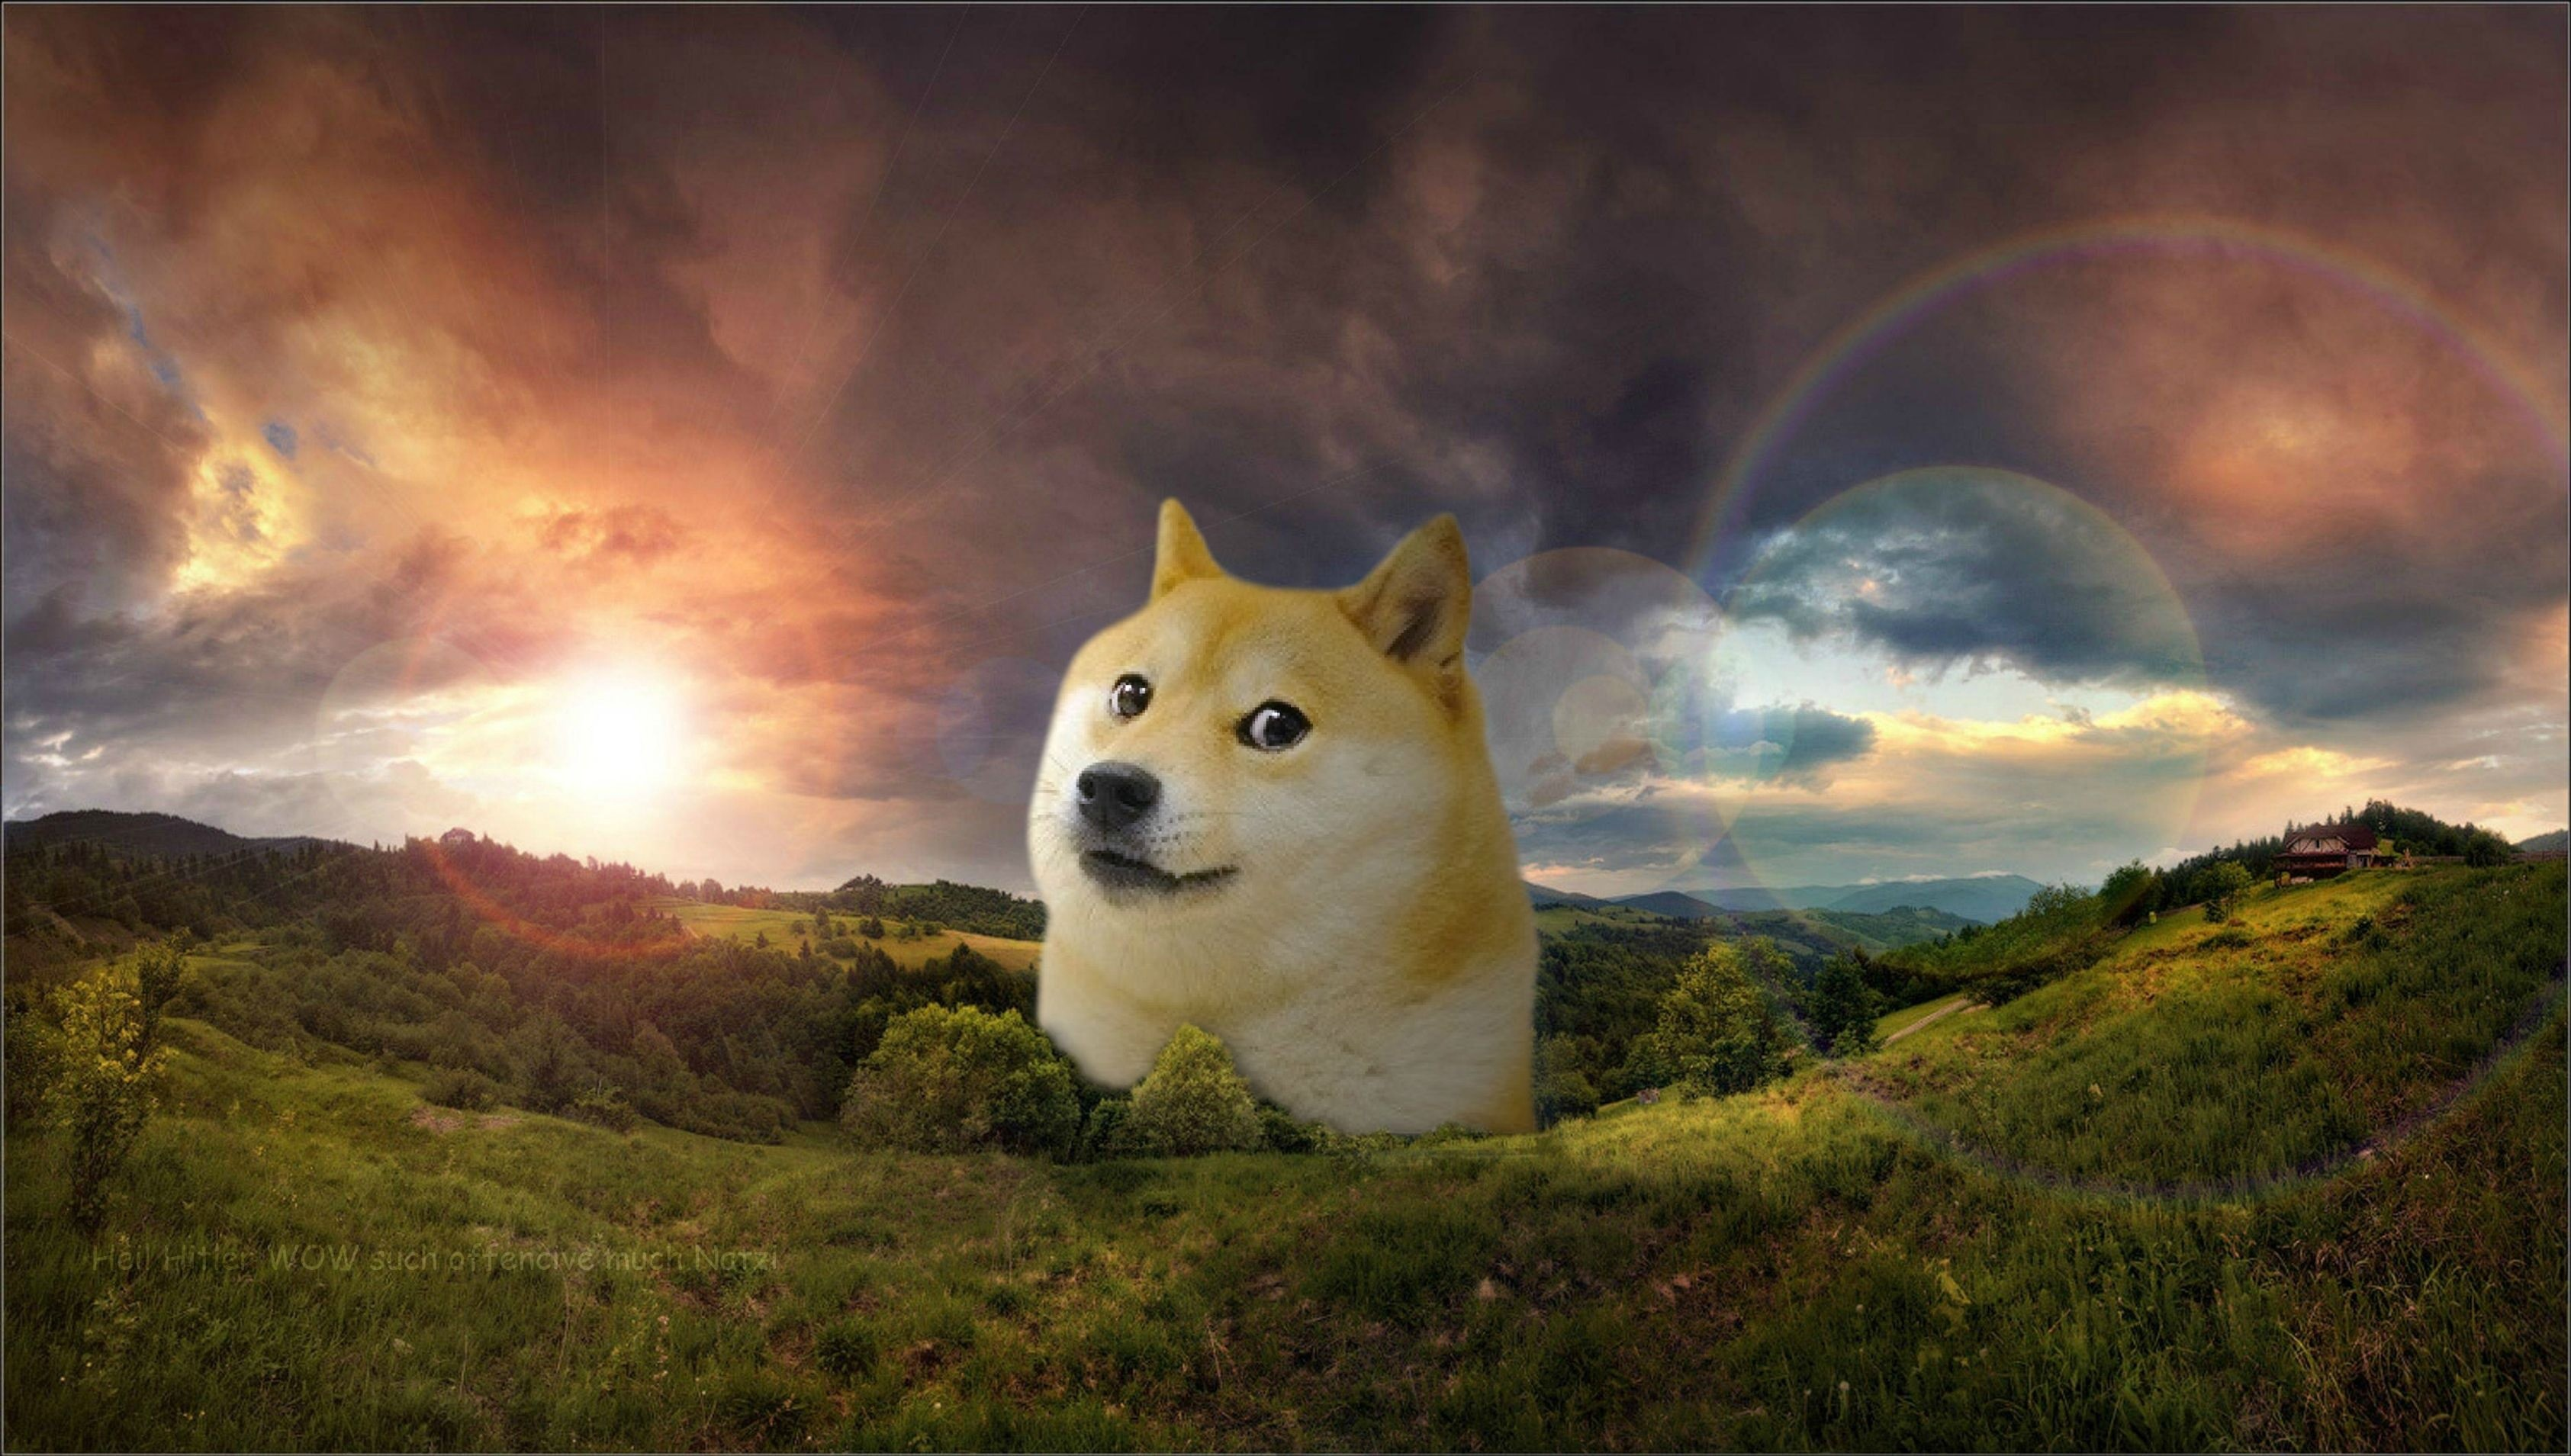 doge-wallpaper-3.jpeg829 KB